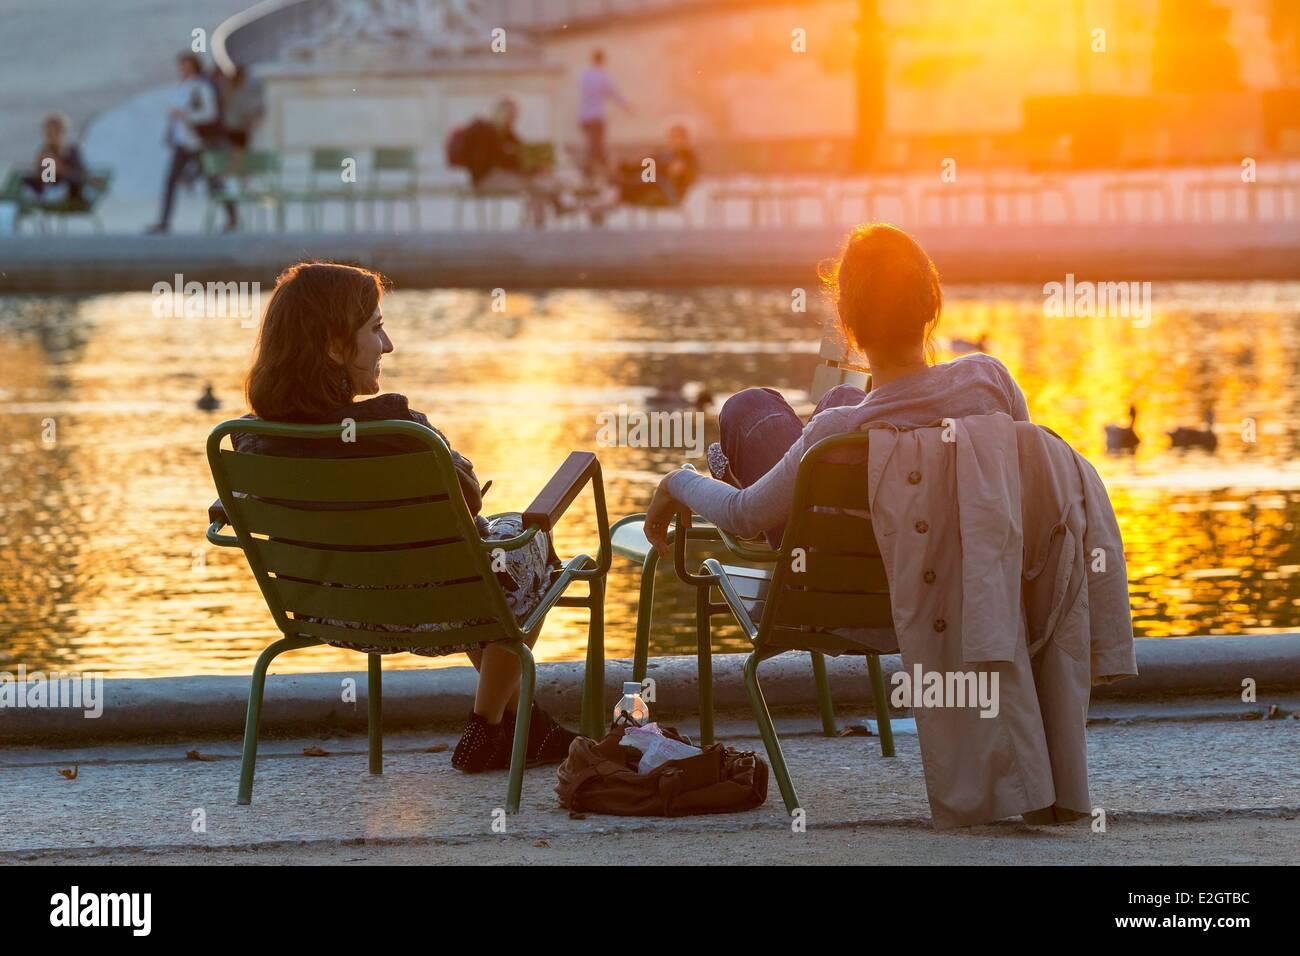 France Paris Jardin des Tuileries at Sunset - Stock Image